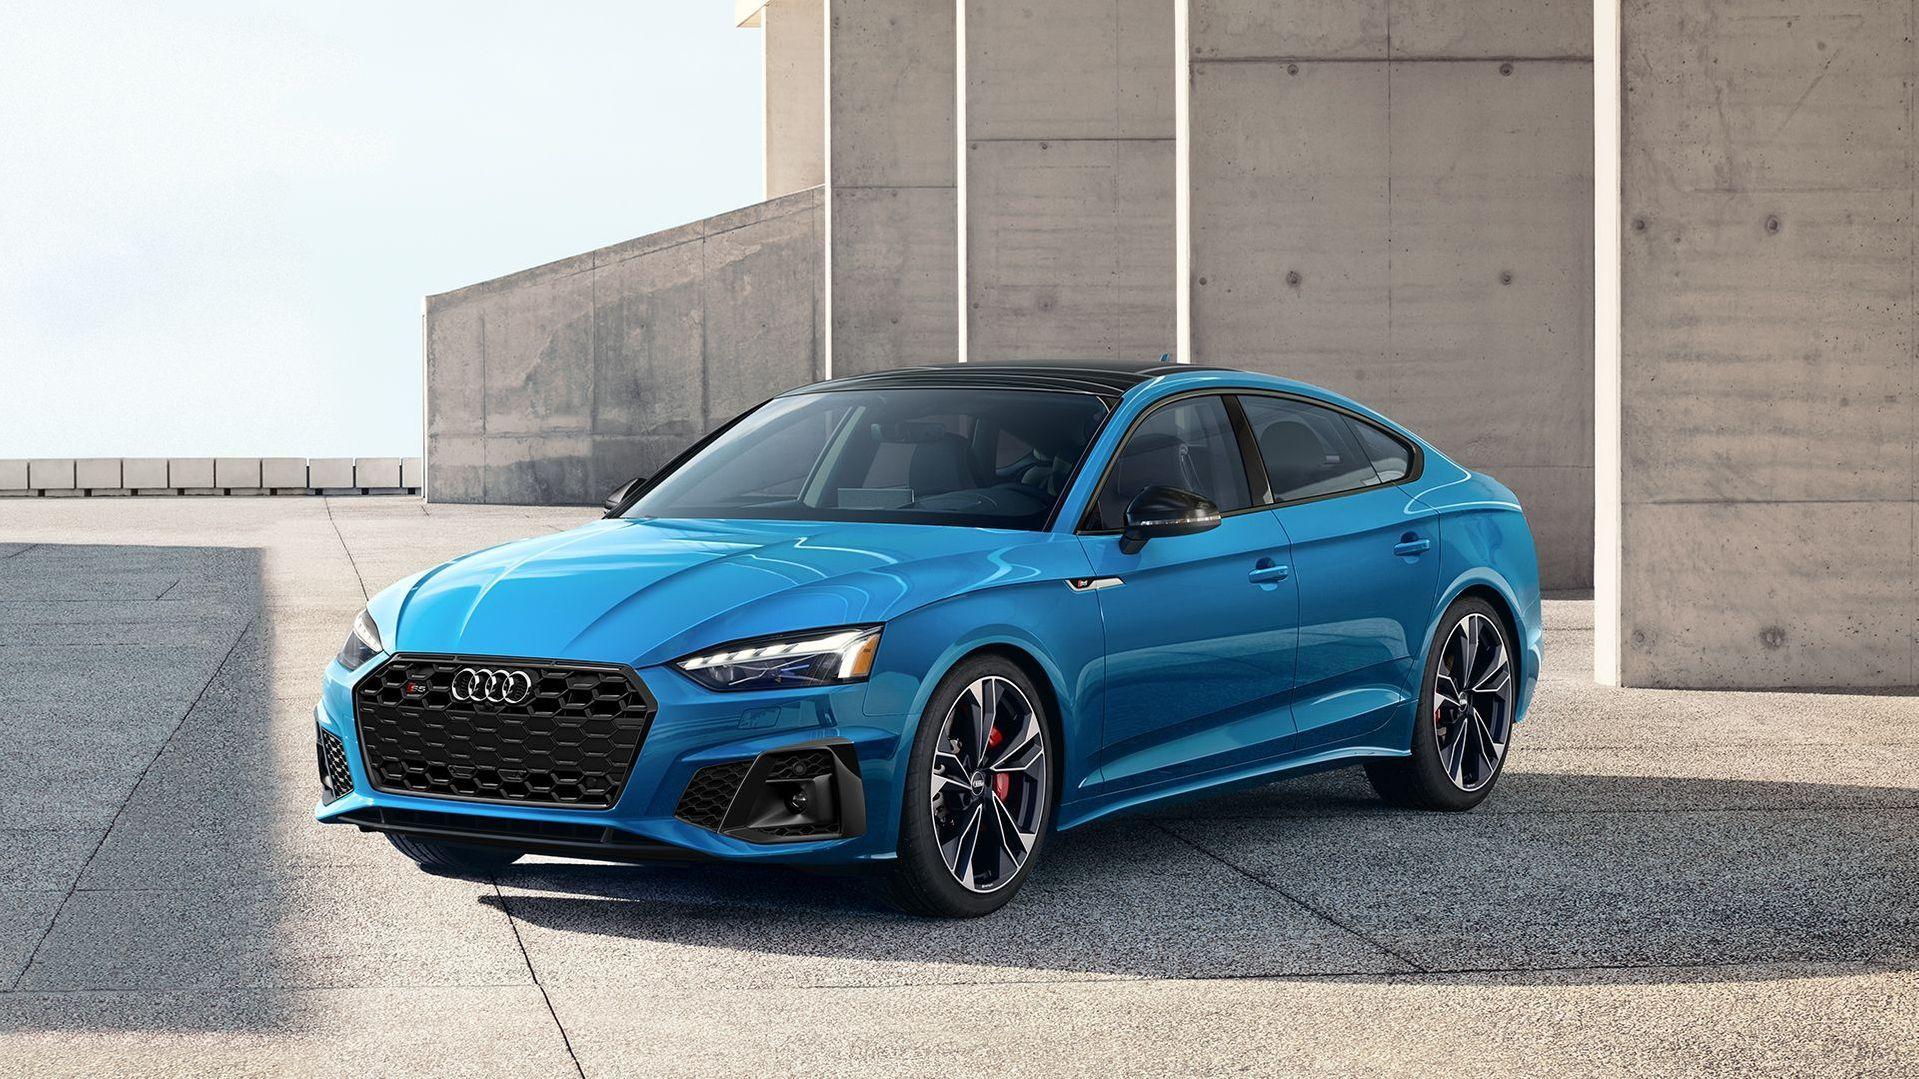 2021 Audi S5 Pictures